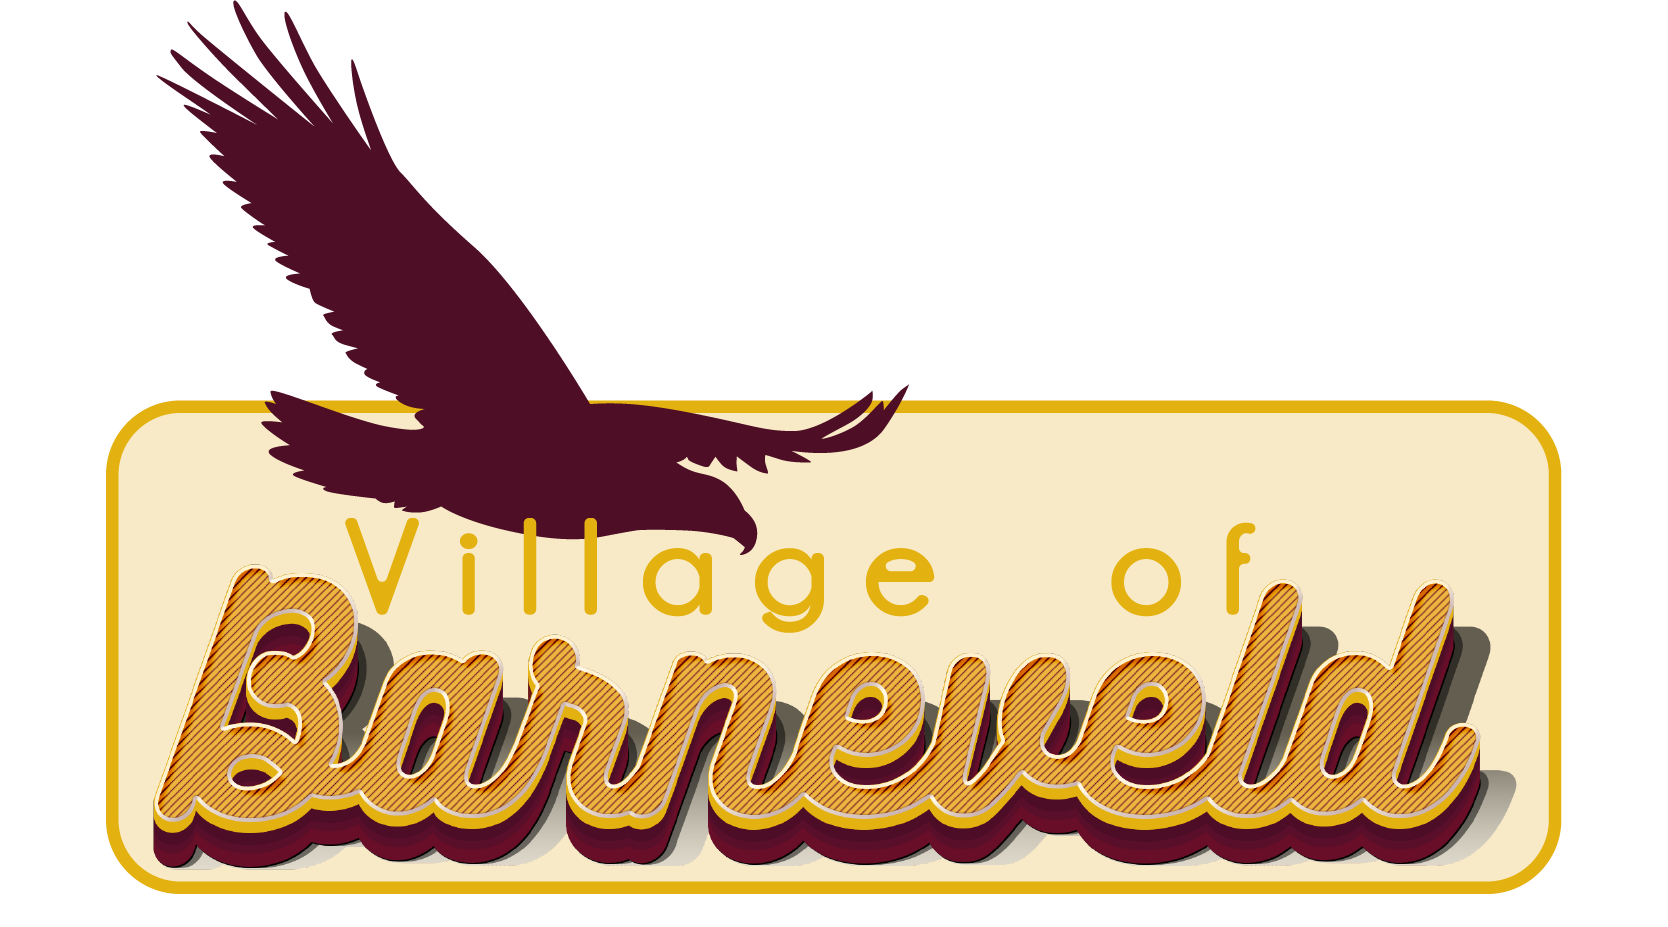 Village of Barneveld